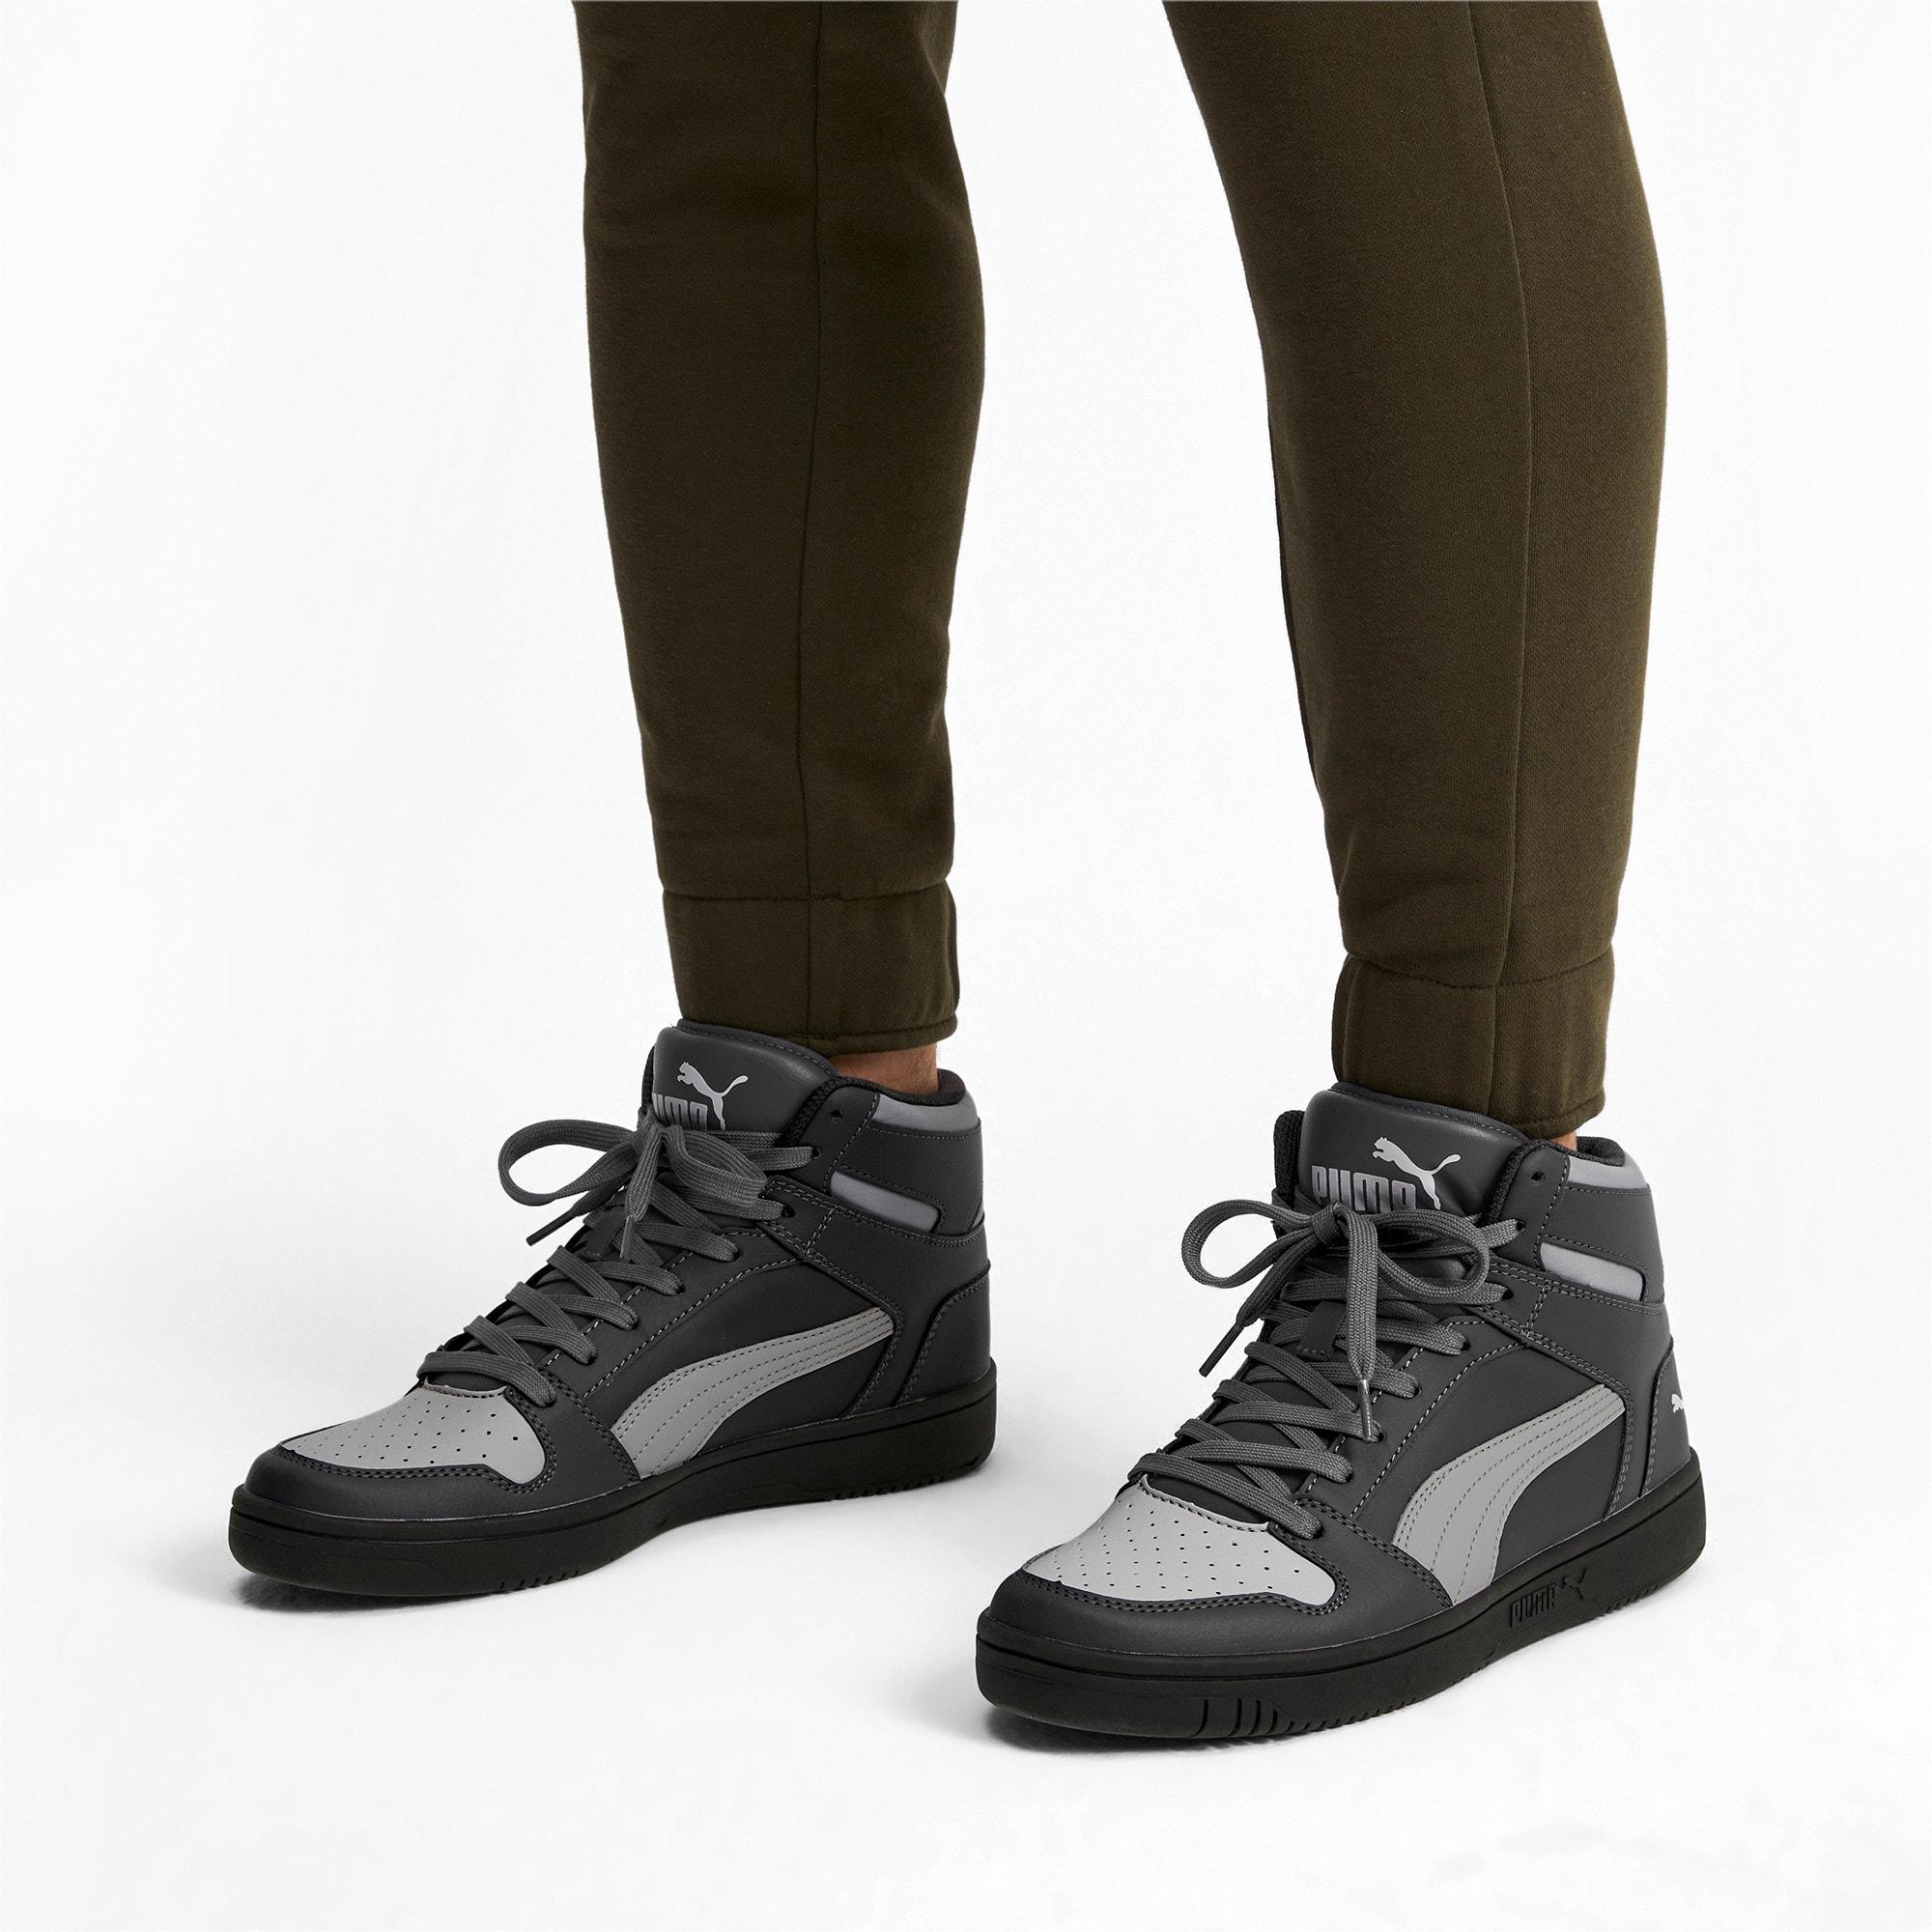 Thumbnail 3 of PUMA Rebound LayUp Sneakers, CASTLEROCK-HRise-White-Black, medium